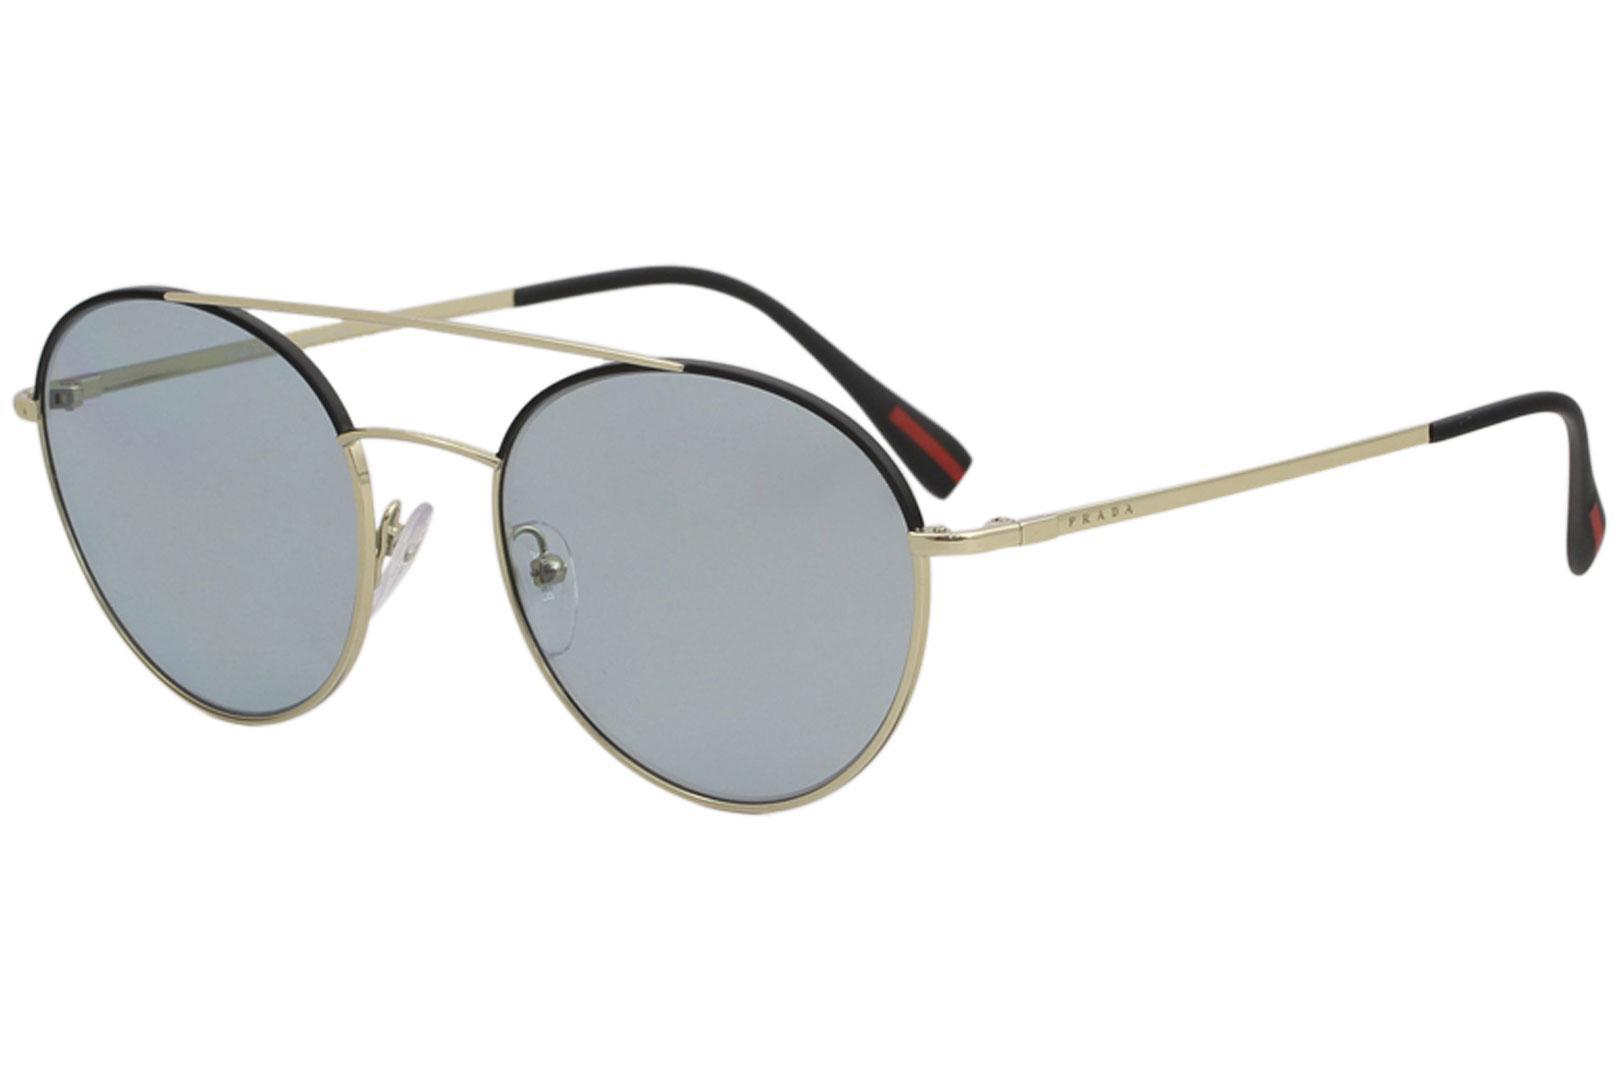 Image of Prada Linea Rossa Men's PS 51SS PS 51/SS Fashion Sunglasses - Pale Gold Black/Blue Gold Mirror   AAV/298 - Lens 54 Bridge 20 B 49.1 ED 56.8 Temple 140mm